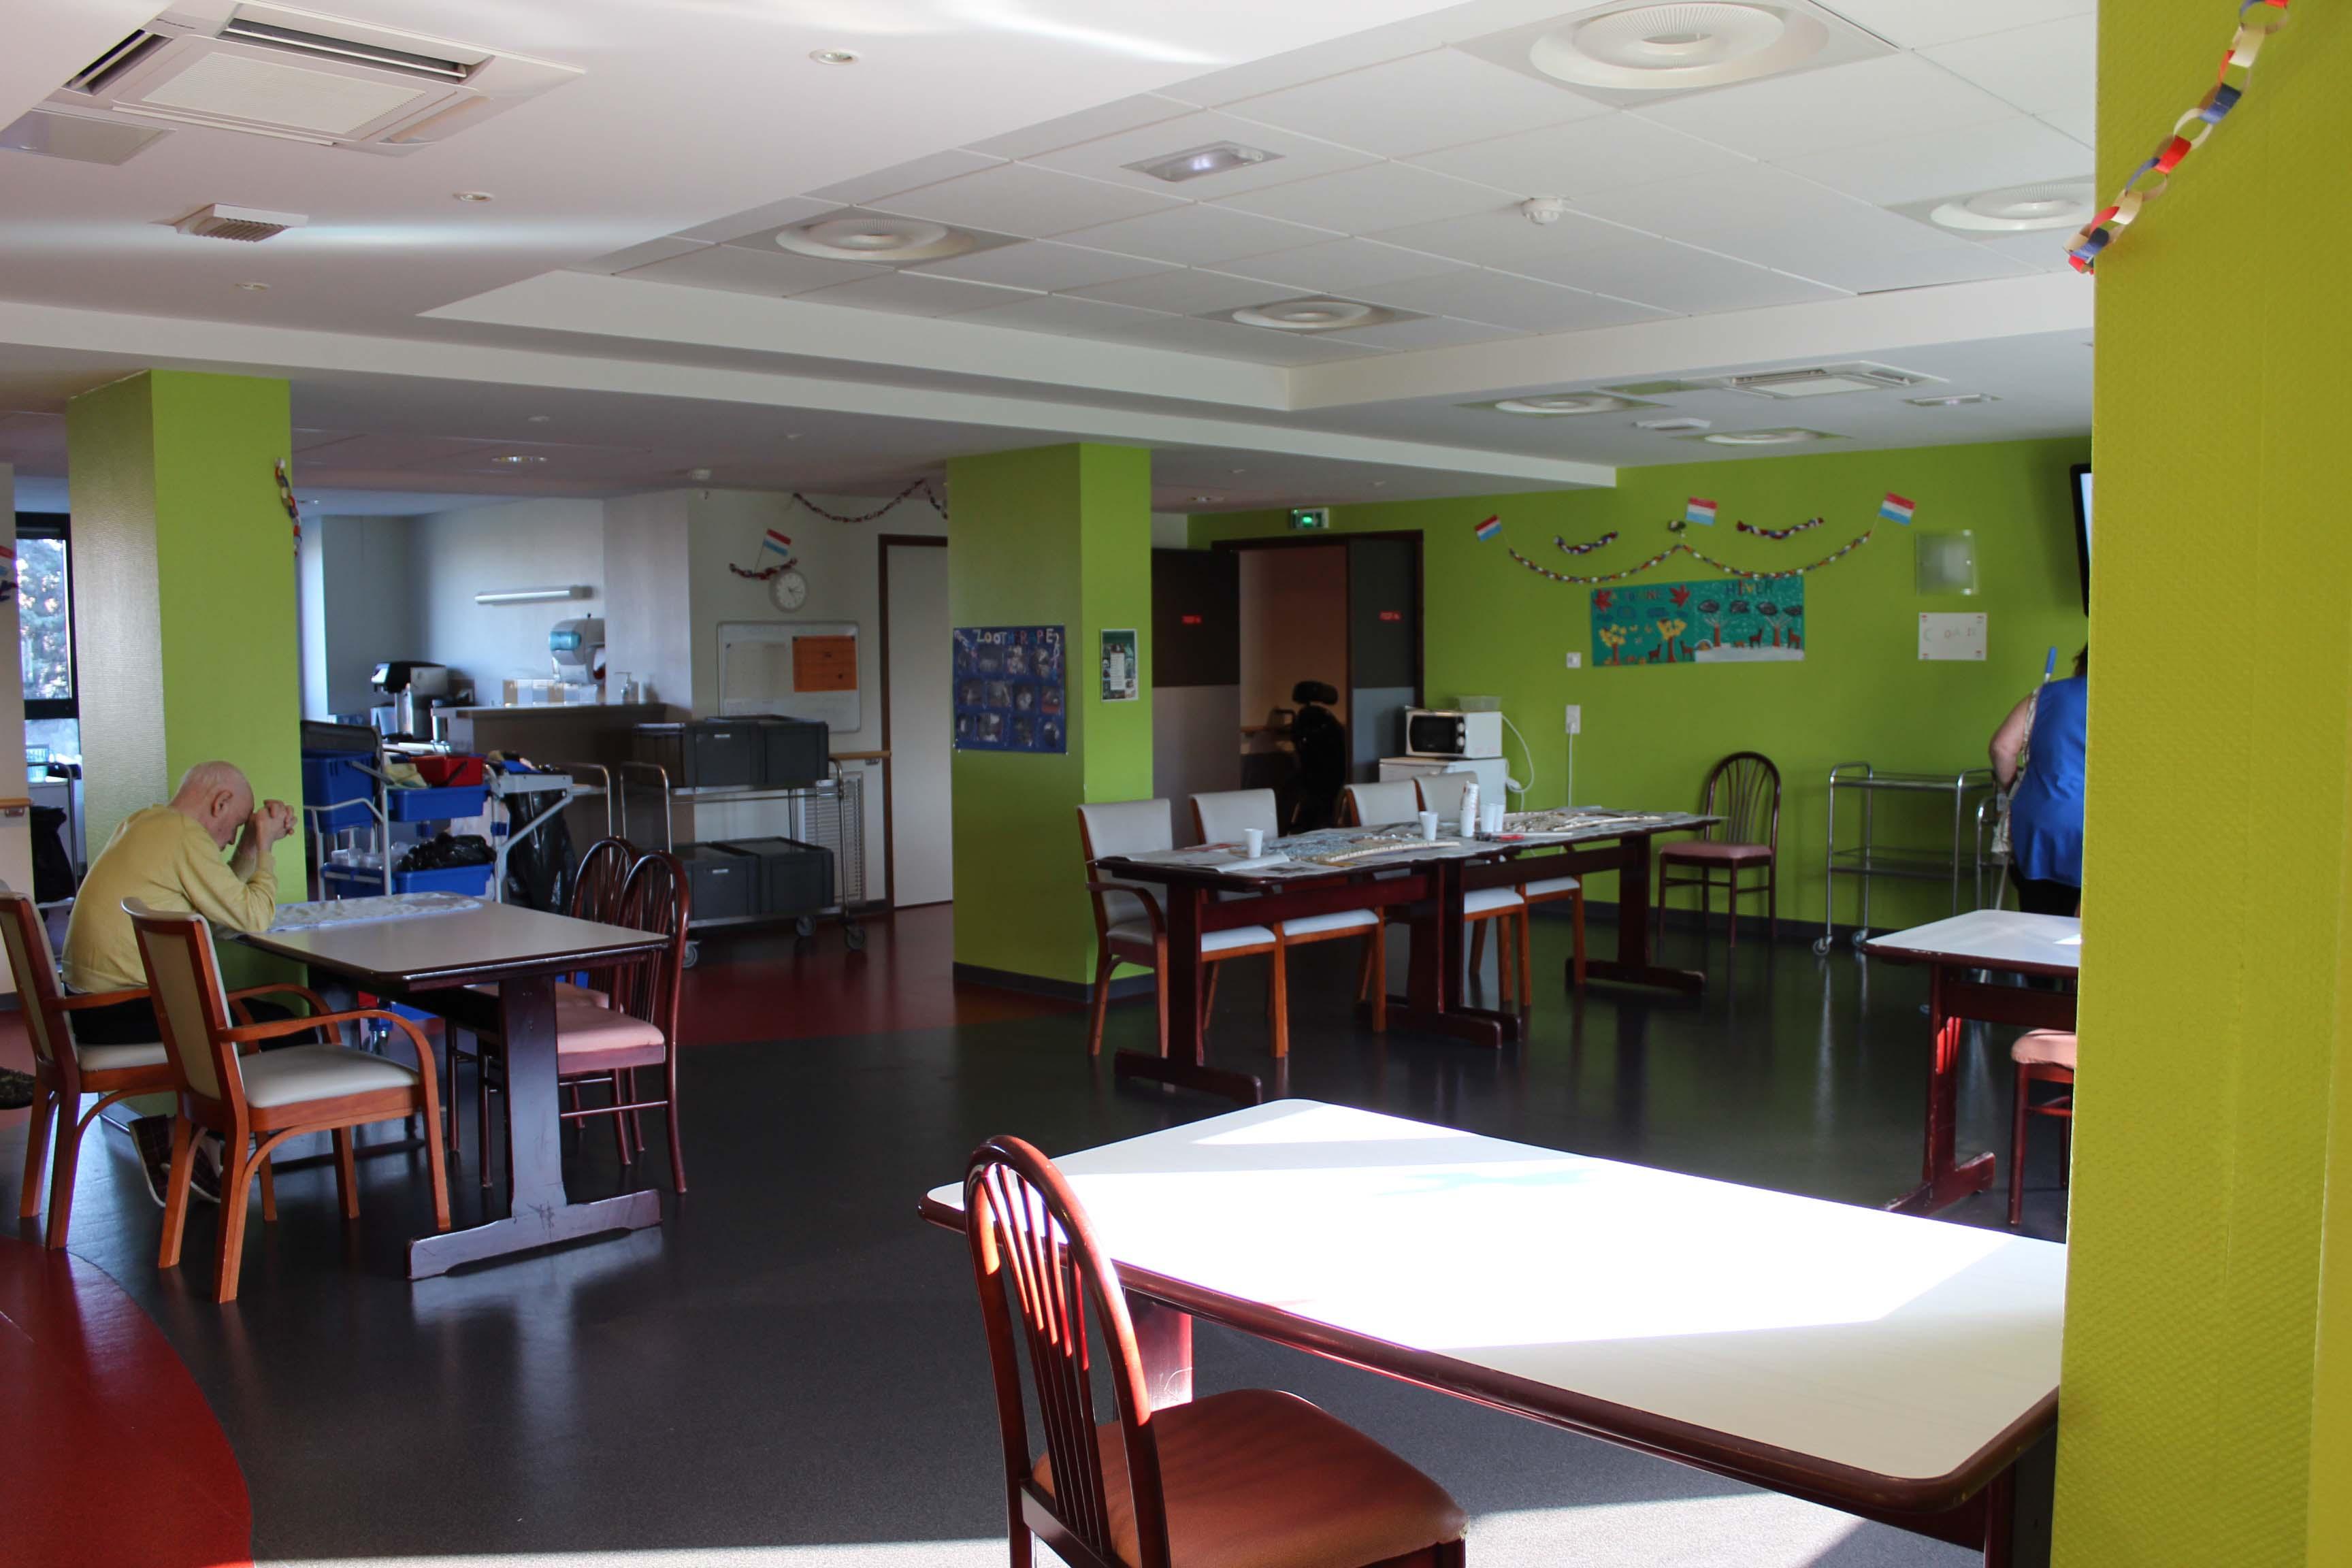 Hôpital Delaroche Salle d'Animation